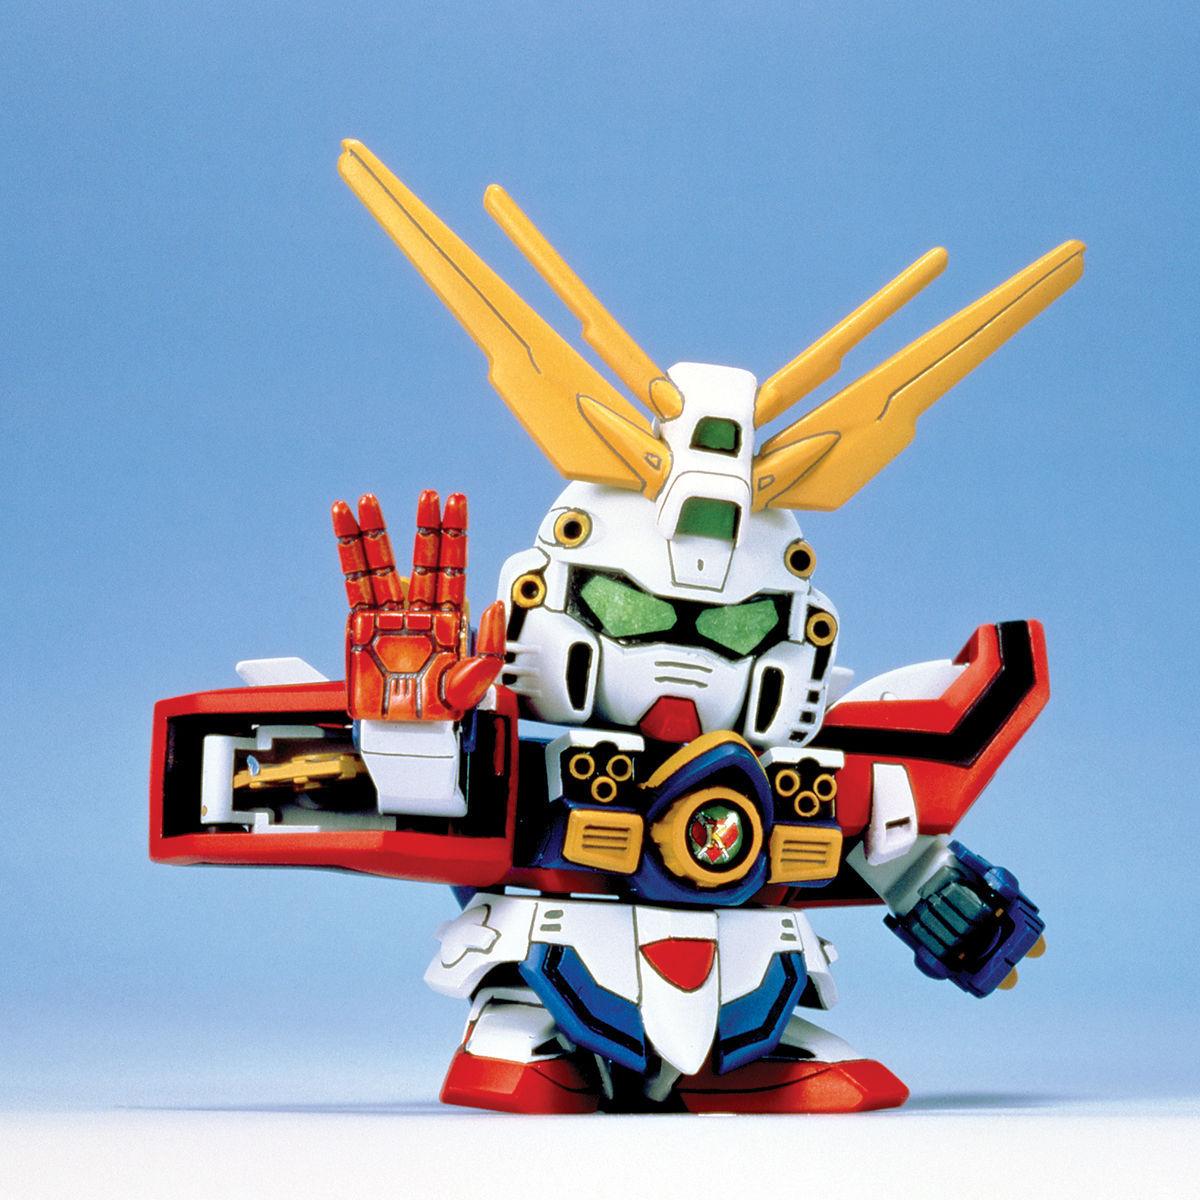 SDガンダム GジェネレーションZERO(GGENERATION-0) 028 GF13-017NJII Gガンダム(ゴッドフィンガーモード) [G Gundam (God Finger Mode)]